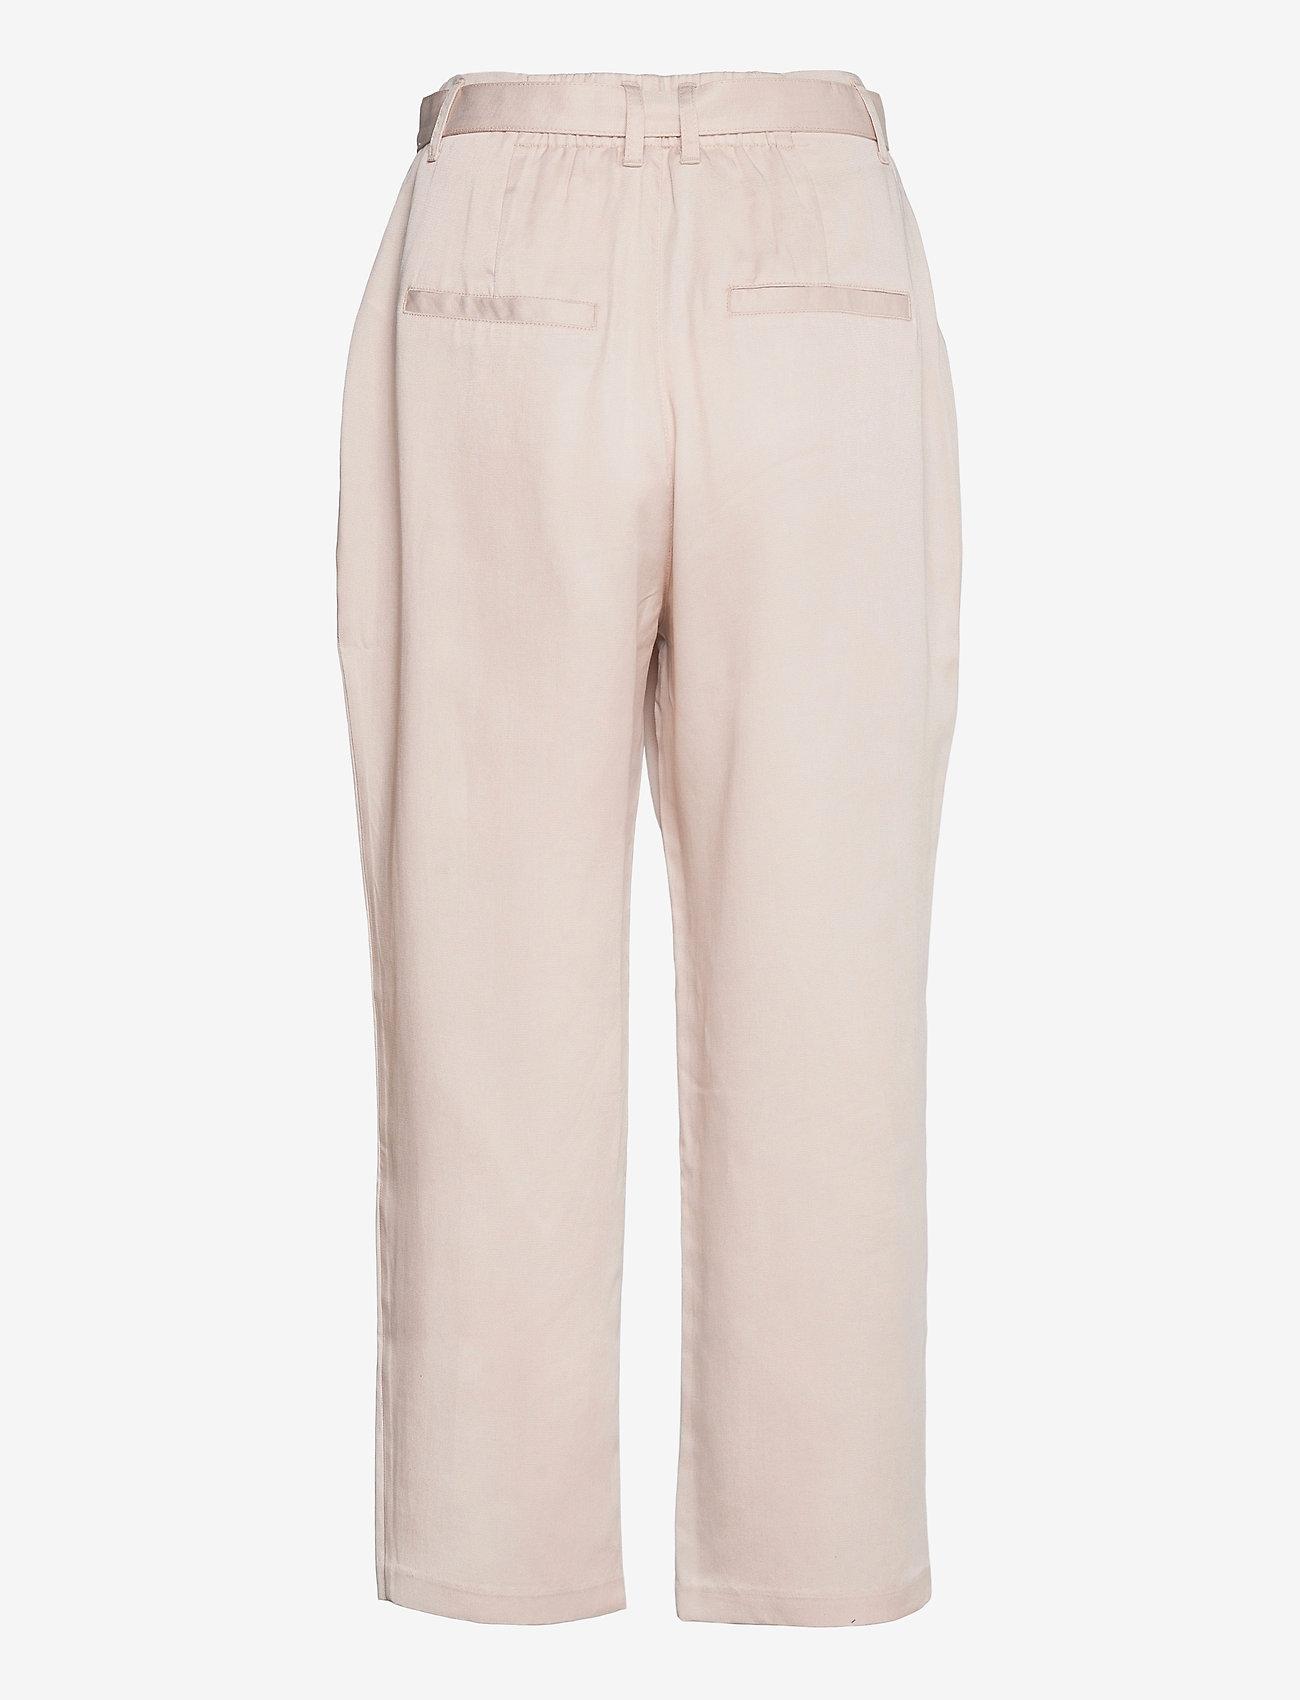 Abercrombie & Fitch - ANF WOMENS PANTS - bukser med lige ben - moonbeam - 1